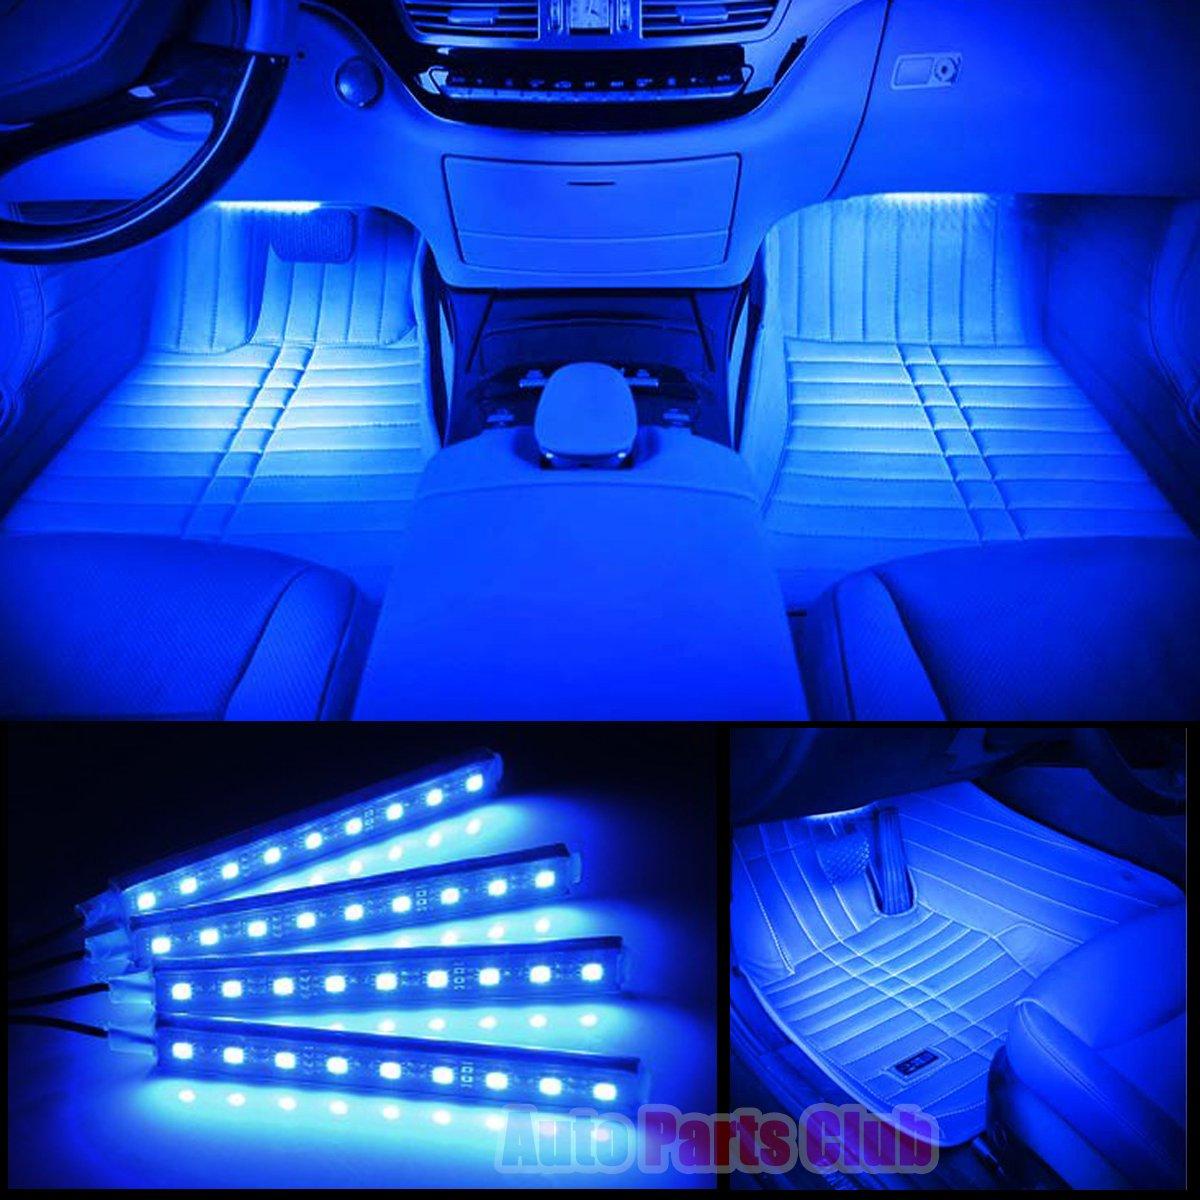 Car Interior Lights,Auto Parts Club 4pcs 12V Led Car Interior Lights/Car Atmosphere Light,Waterproof Glow Neon Light Strips Styling Interior Dash Floor Foot Decoration Light Lamp(Blue)